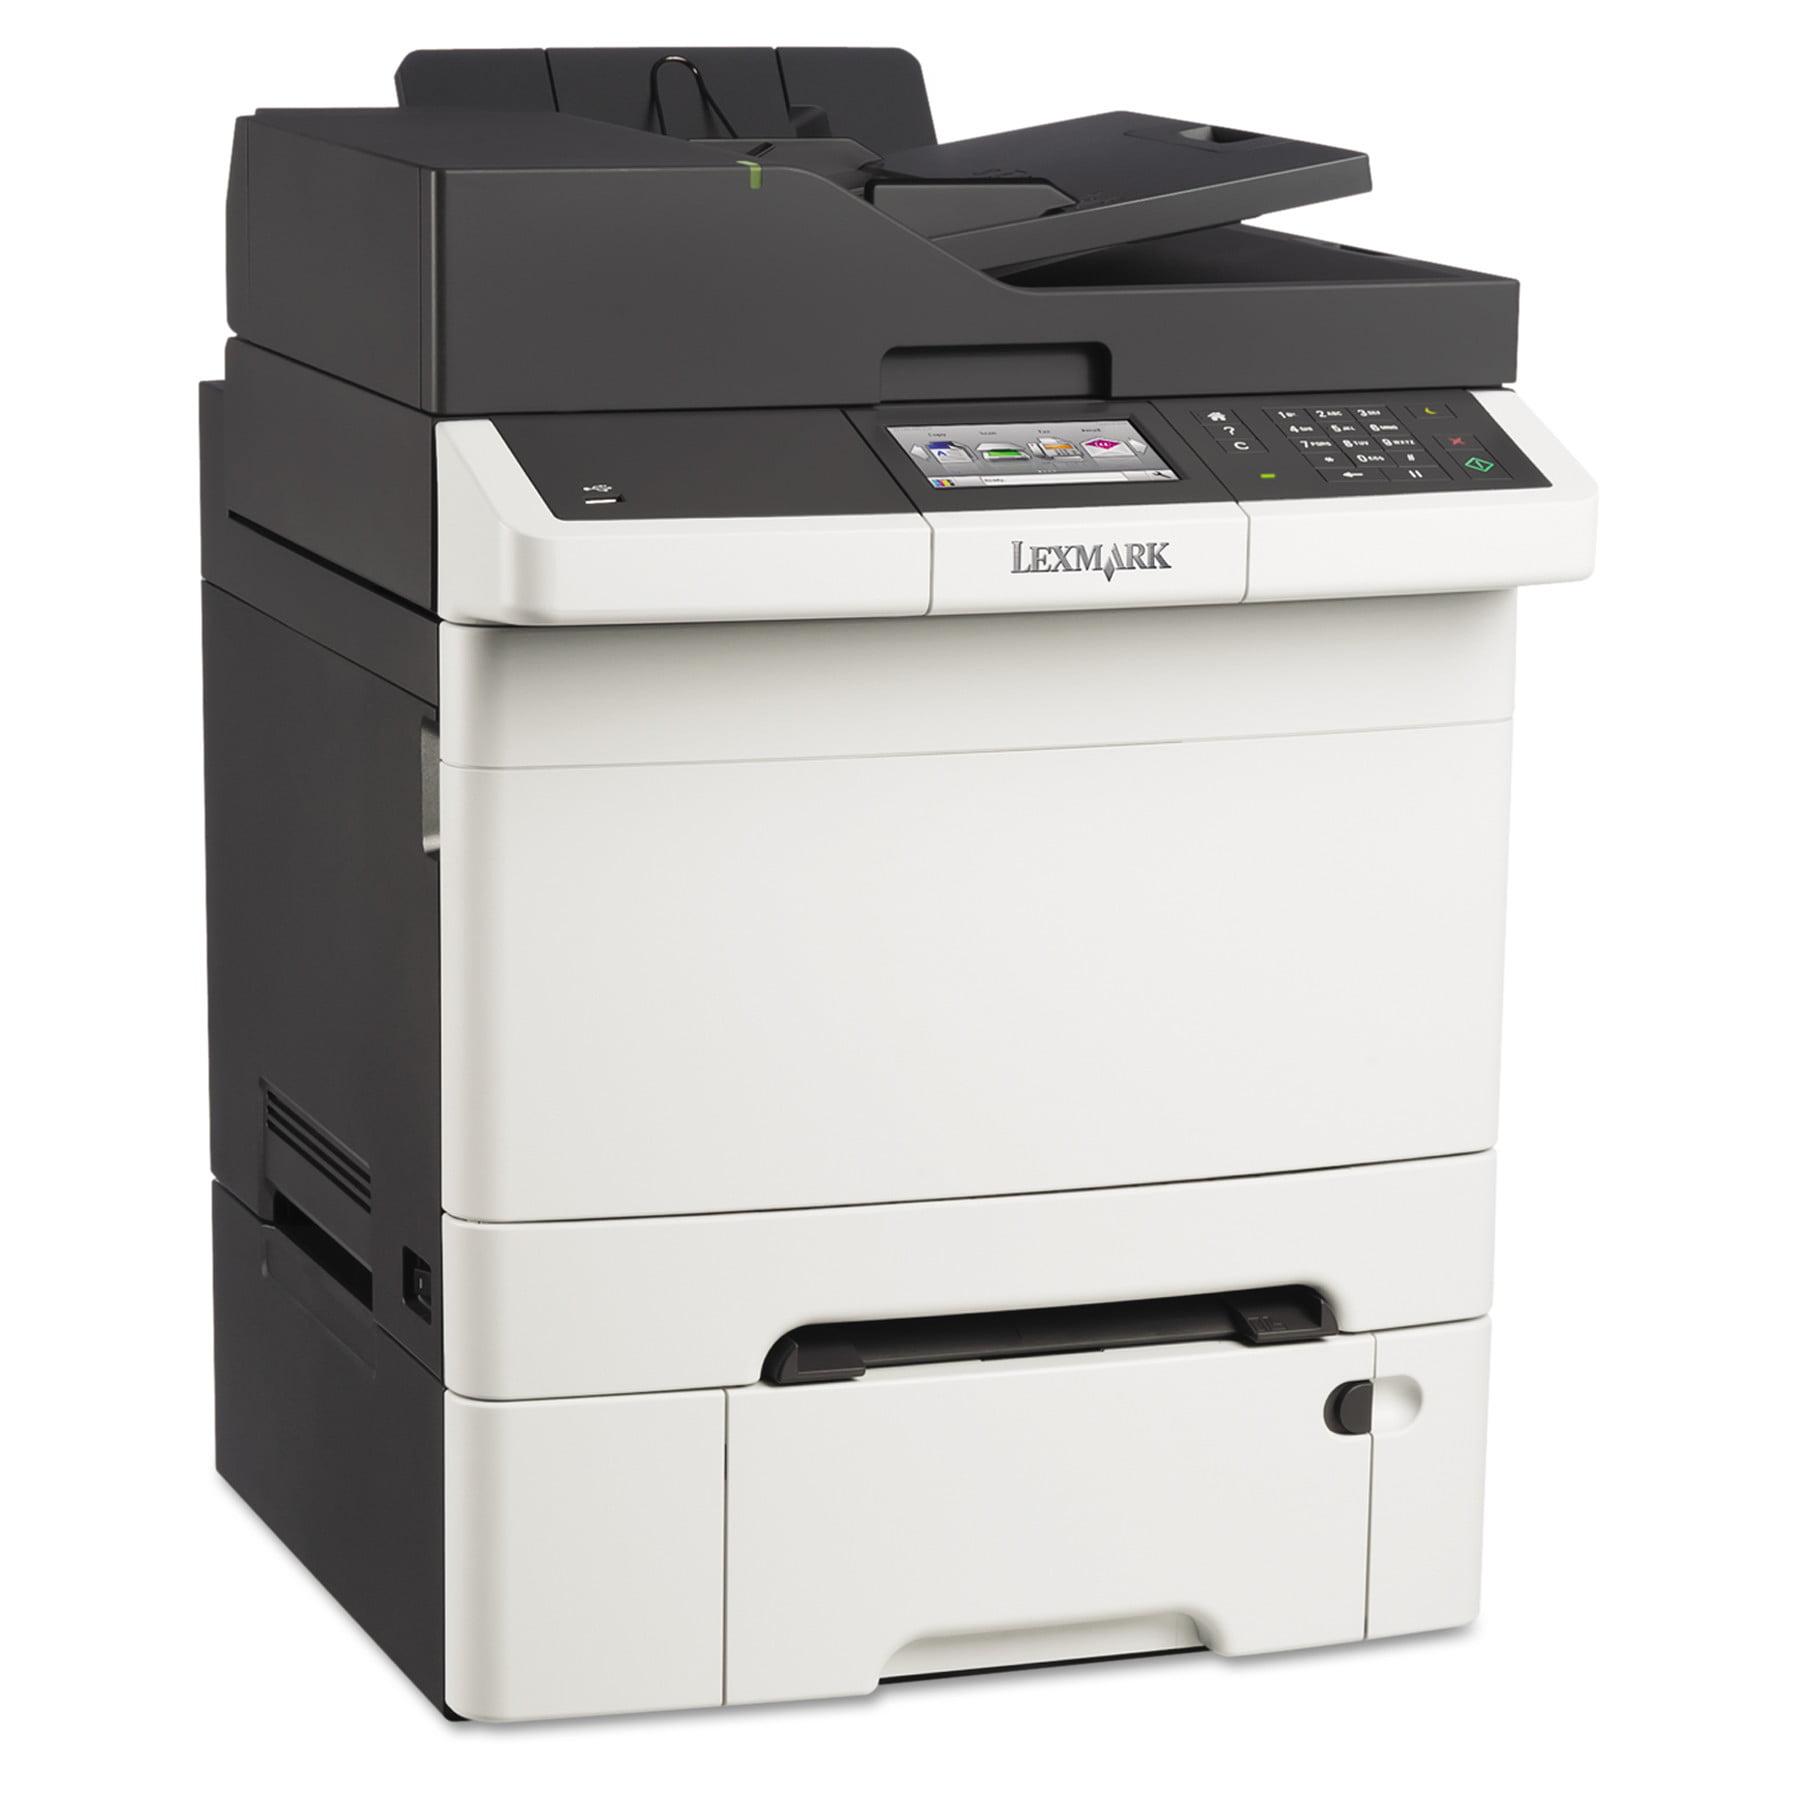 Lexmark CX410dte Multifunction Color Laser Printer, Copy/Fax/Print/Scan